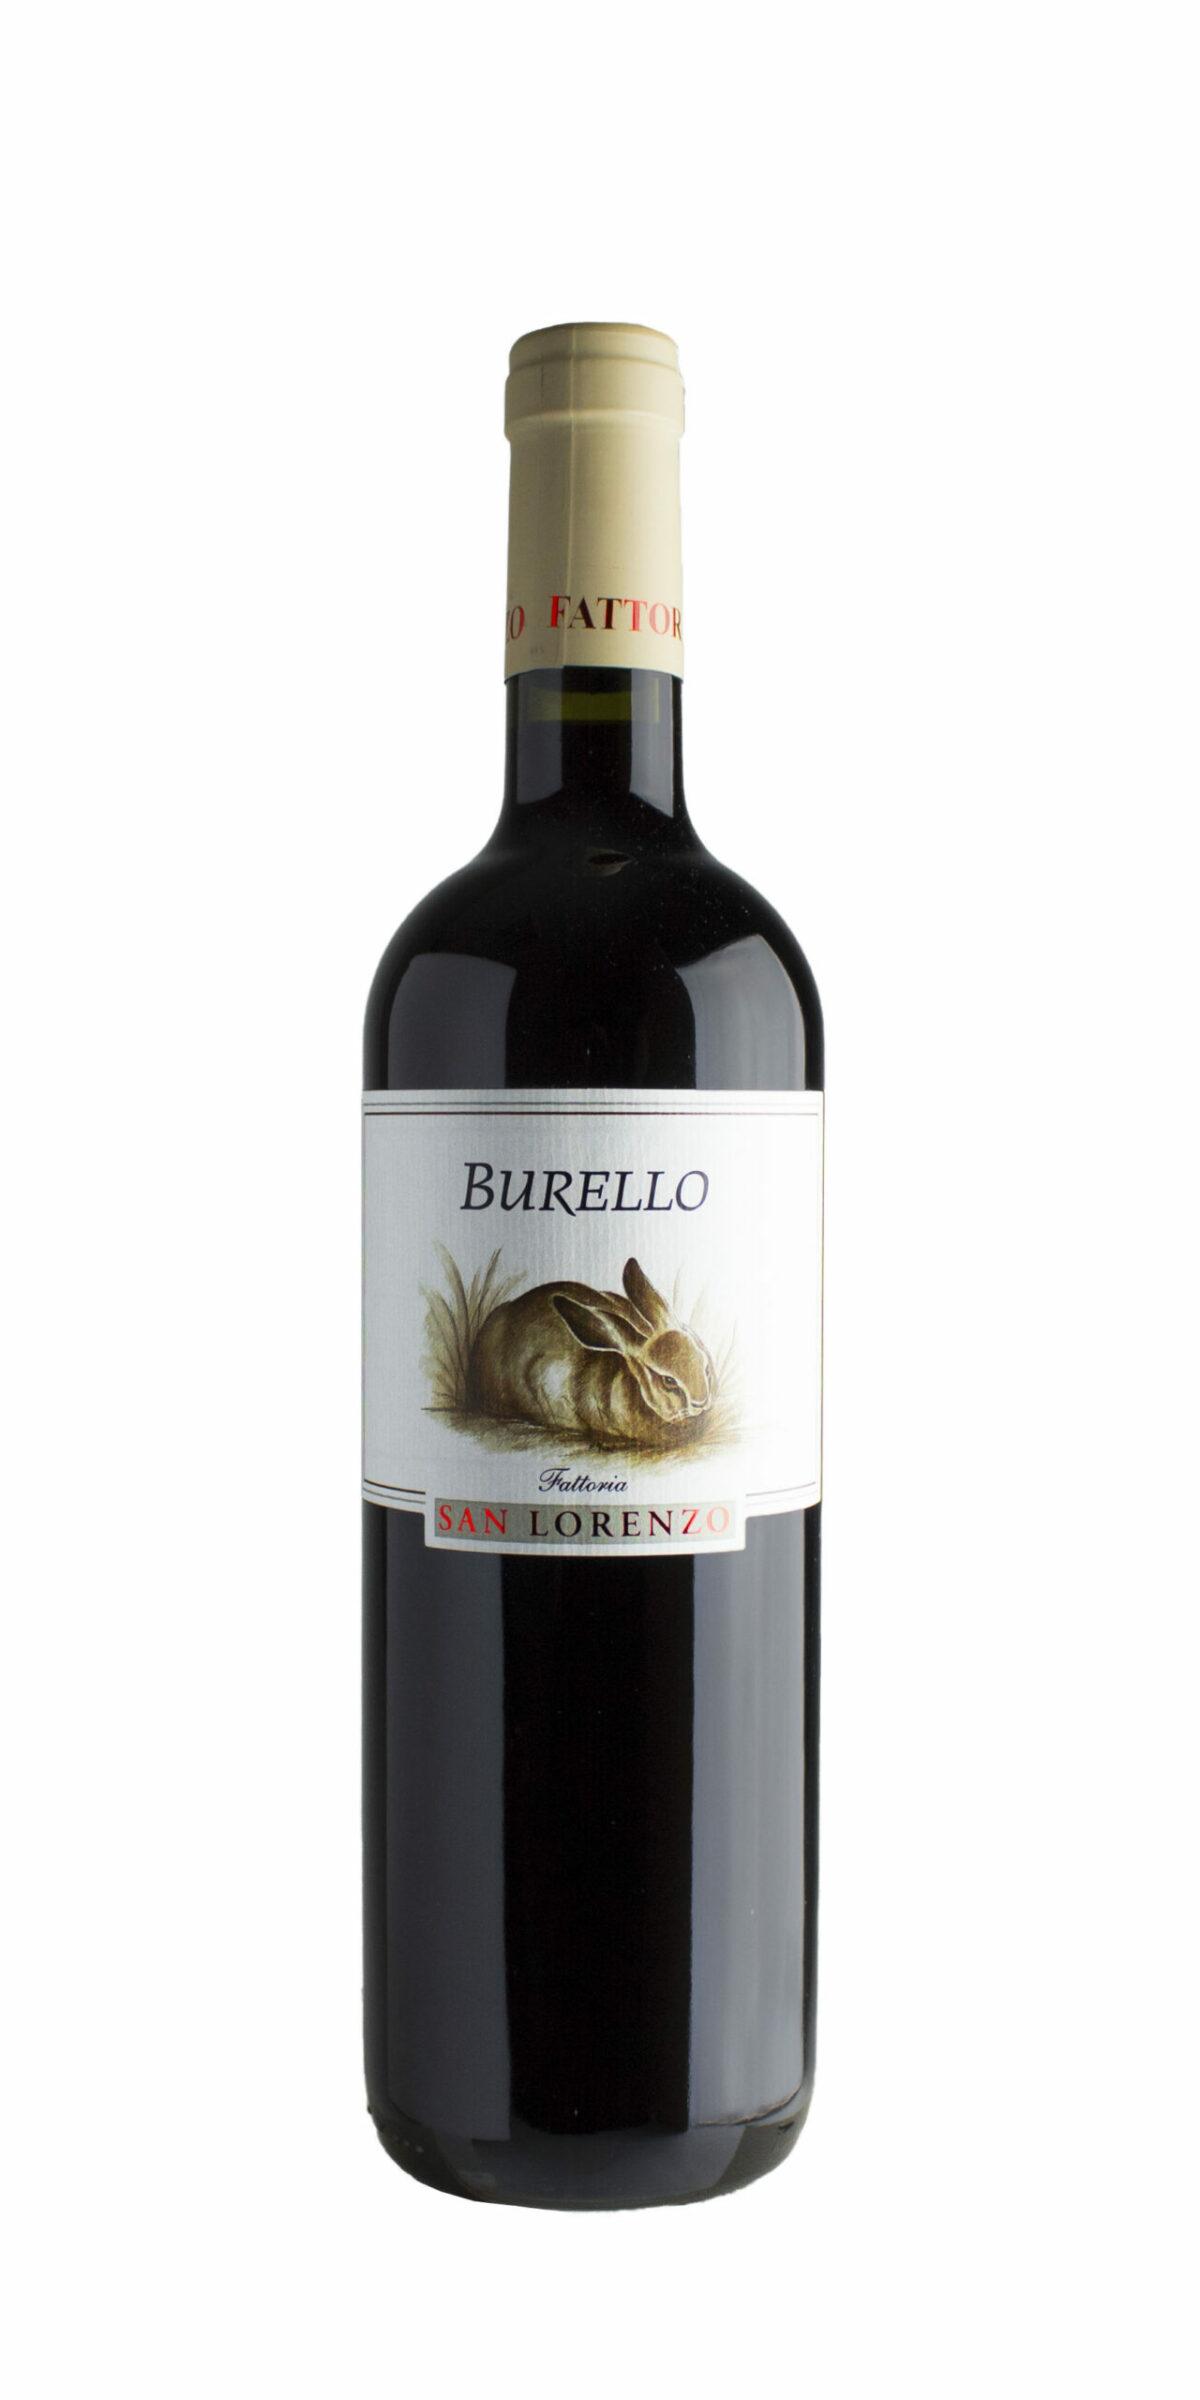 San Lorenzo Rosso Piceno 'Burello' 2013